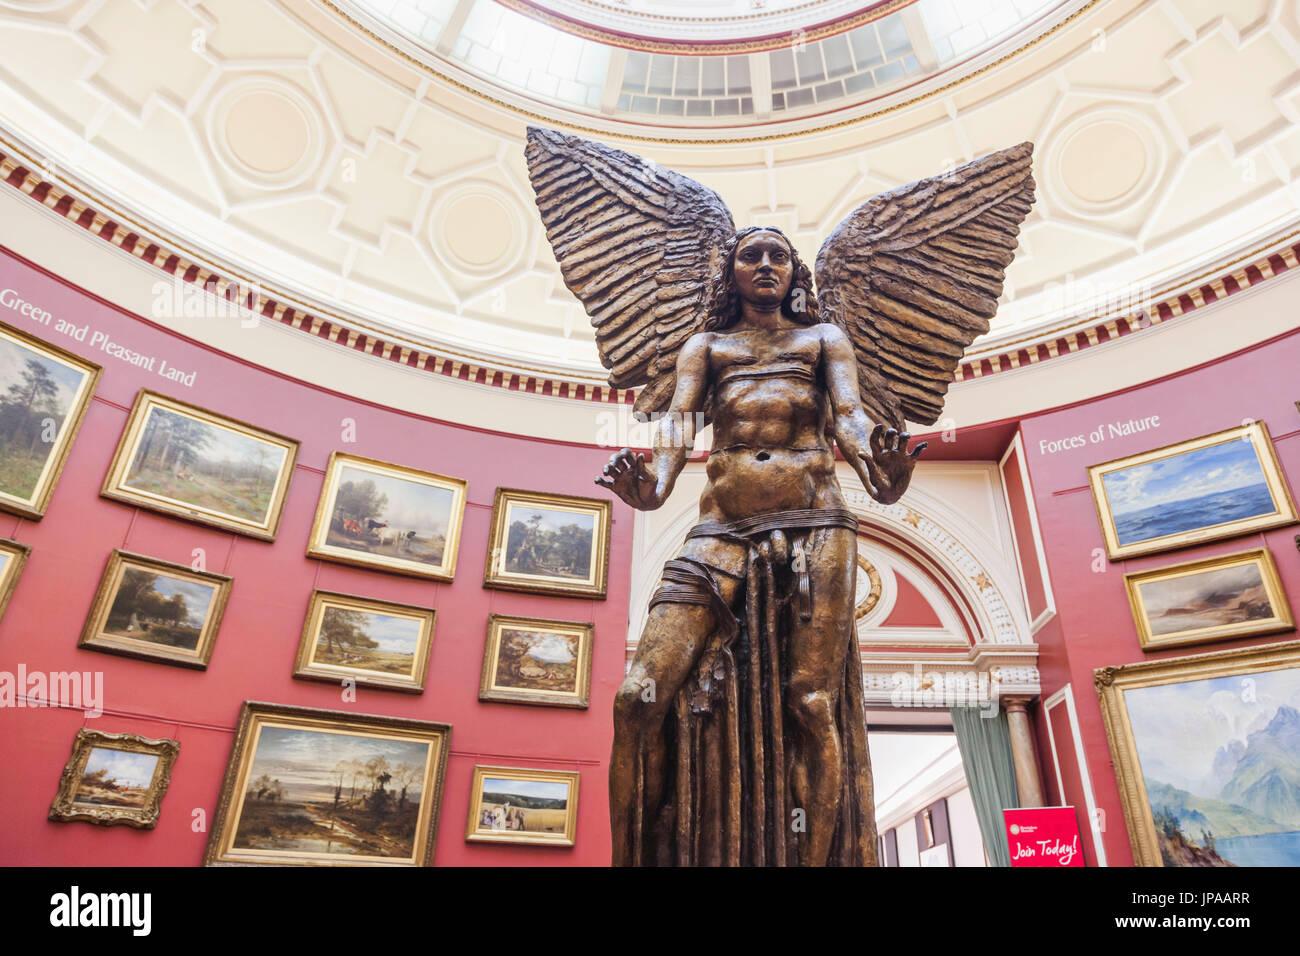 England, West Midlands, Birmingham, Birmingham Museum and Art Gallery, Bronze Statue of Lucifer by Jacob Epstein - Stock Image